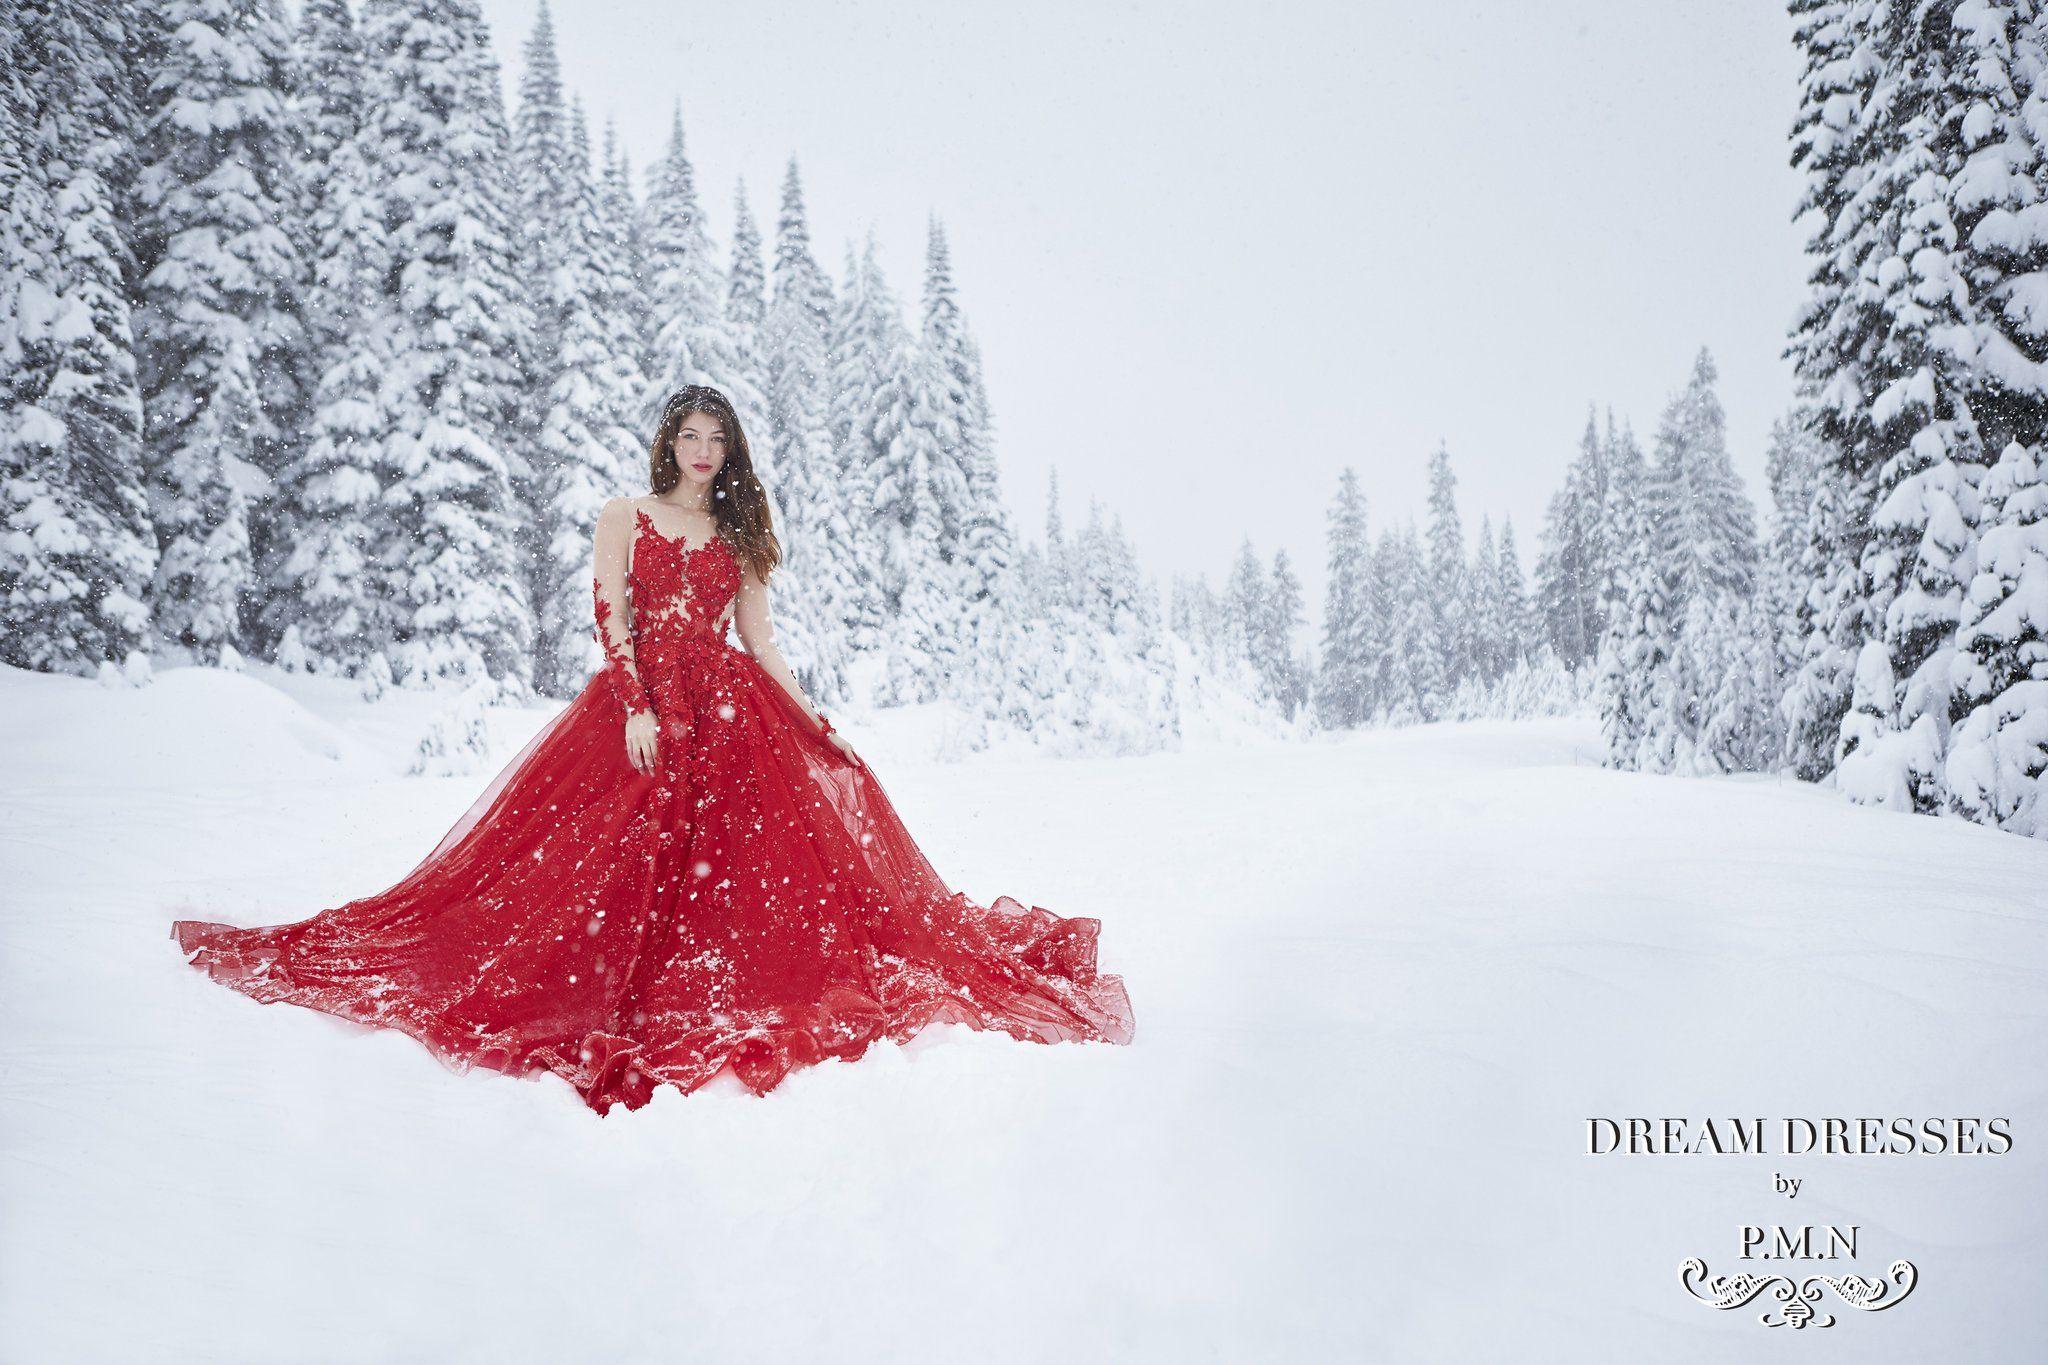 Winter wonderland styled shoot dream dress red wedding dresses